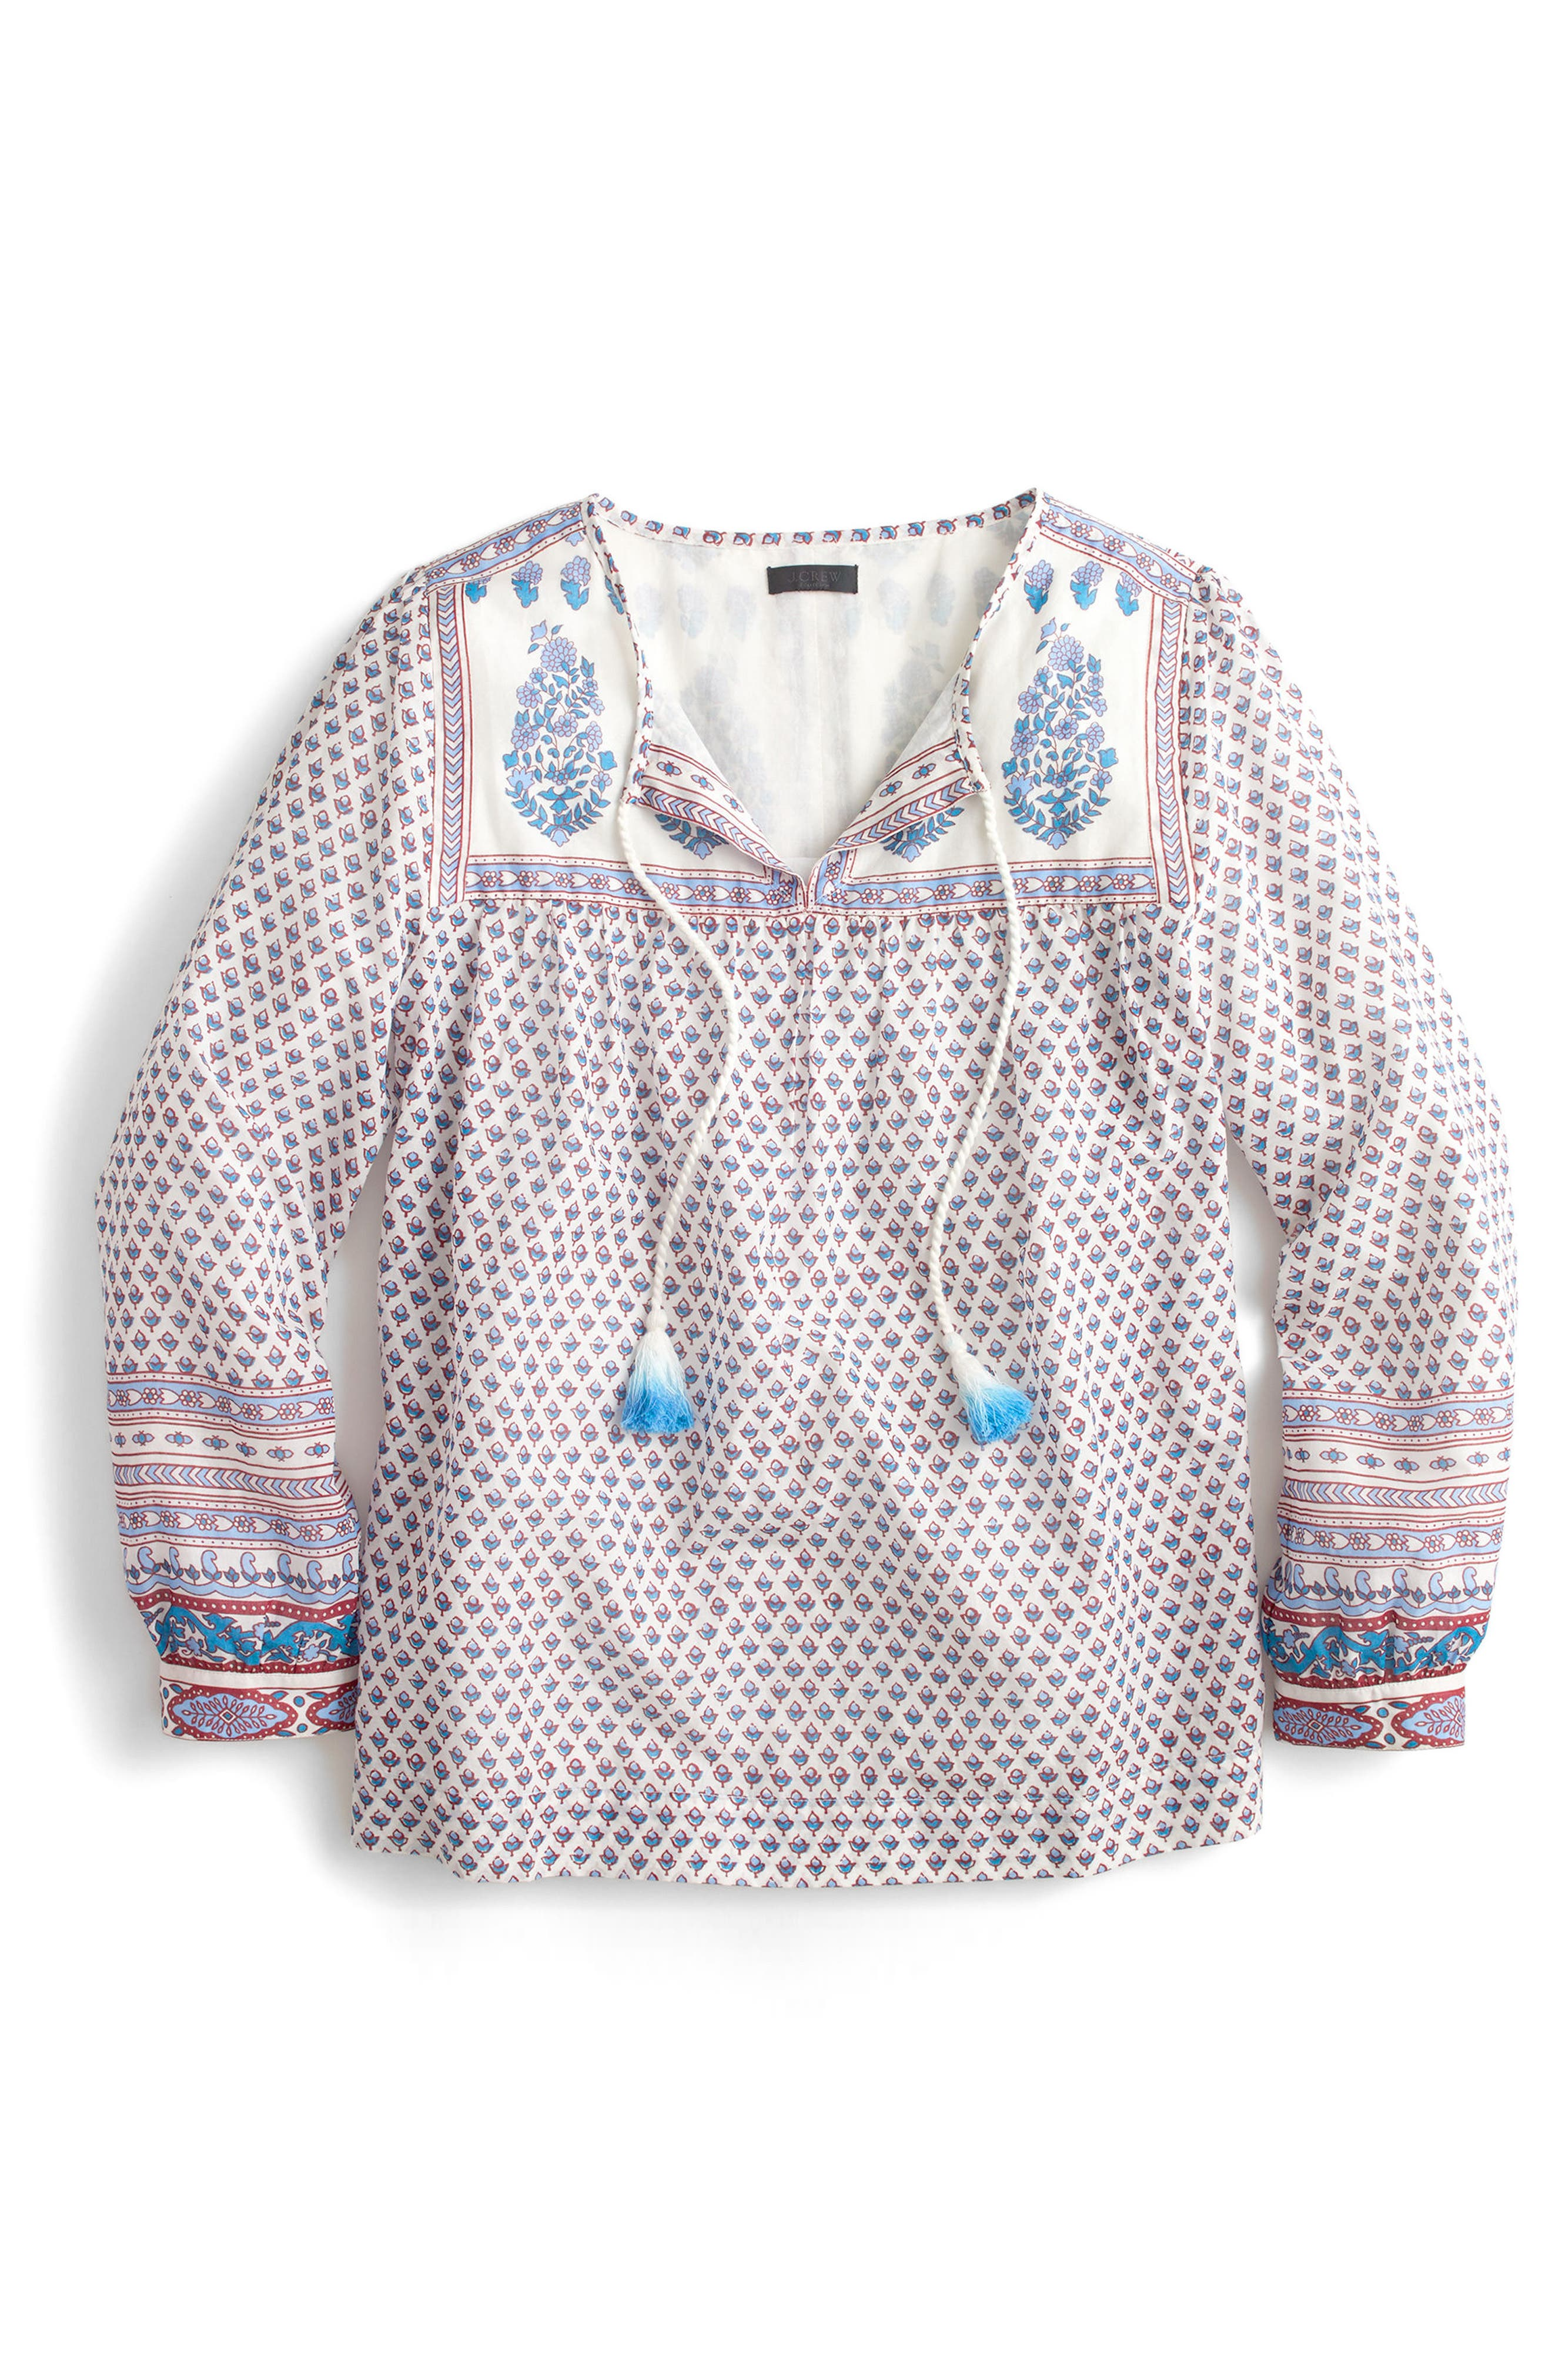 Floral Paisley Cotton Peasant Top,                             Alternate thumbnail 3, color,                             Bright Periwinkle